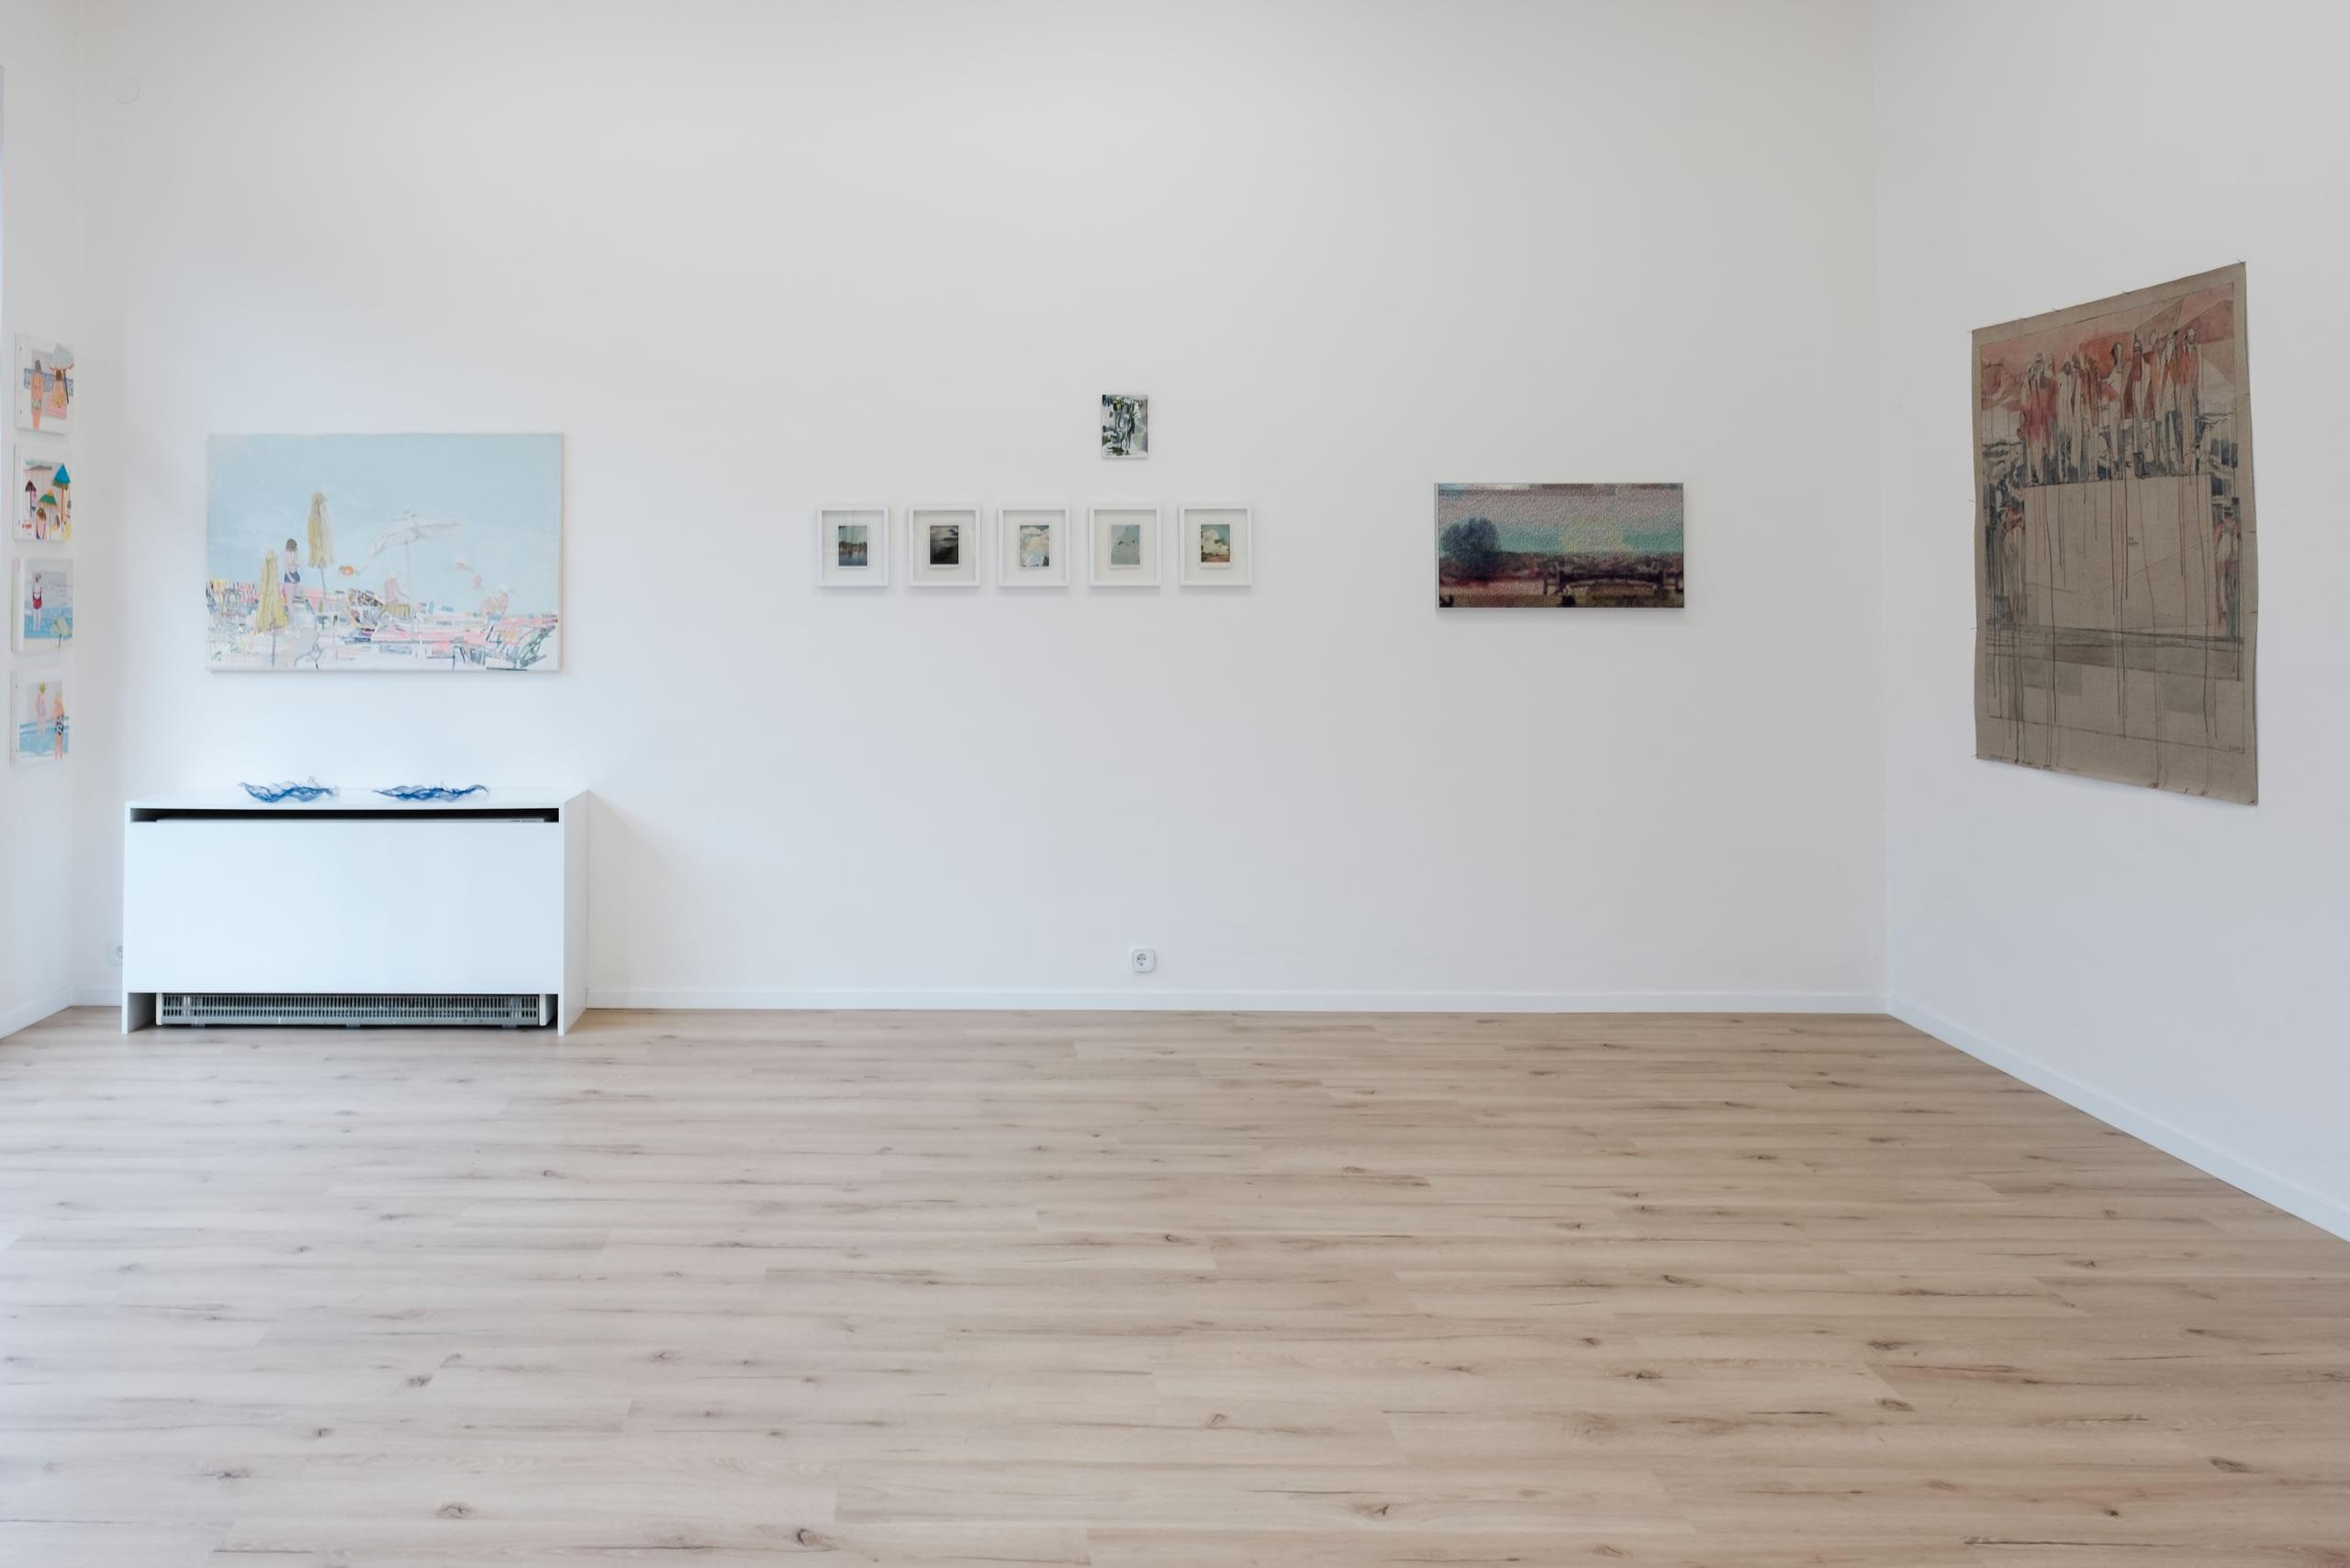 3. Törn | Anthia Loizou | Elisabeth Wedenig | Manuel Obrijetan | Maria Legat | Foto Manu Lasnik | 2019 | Galerie3